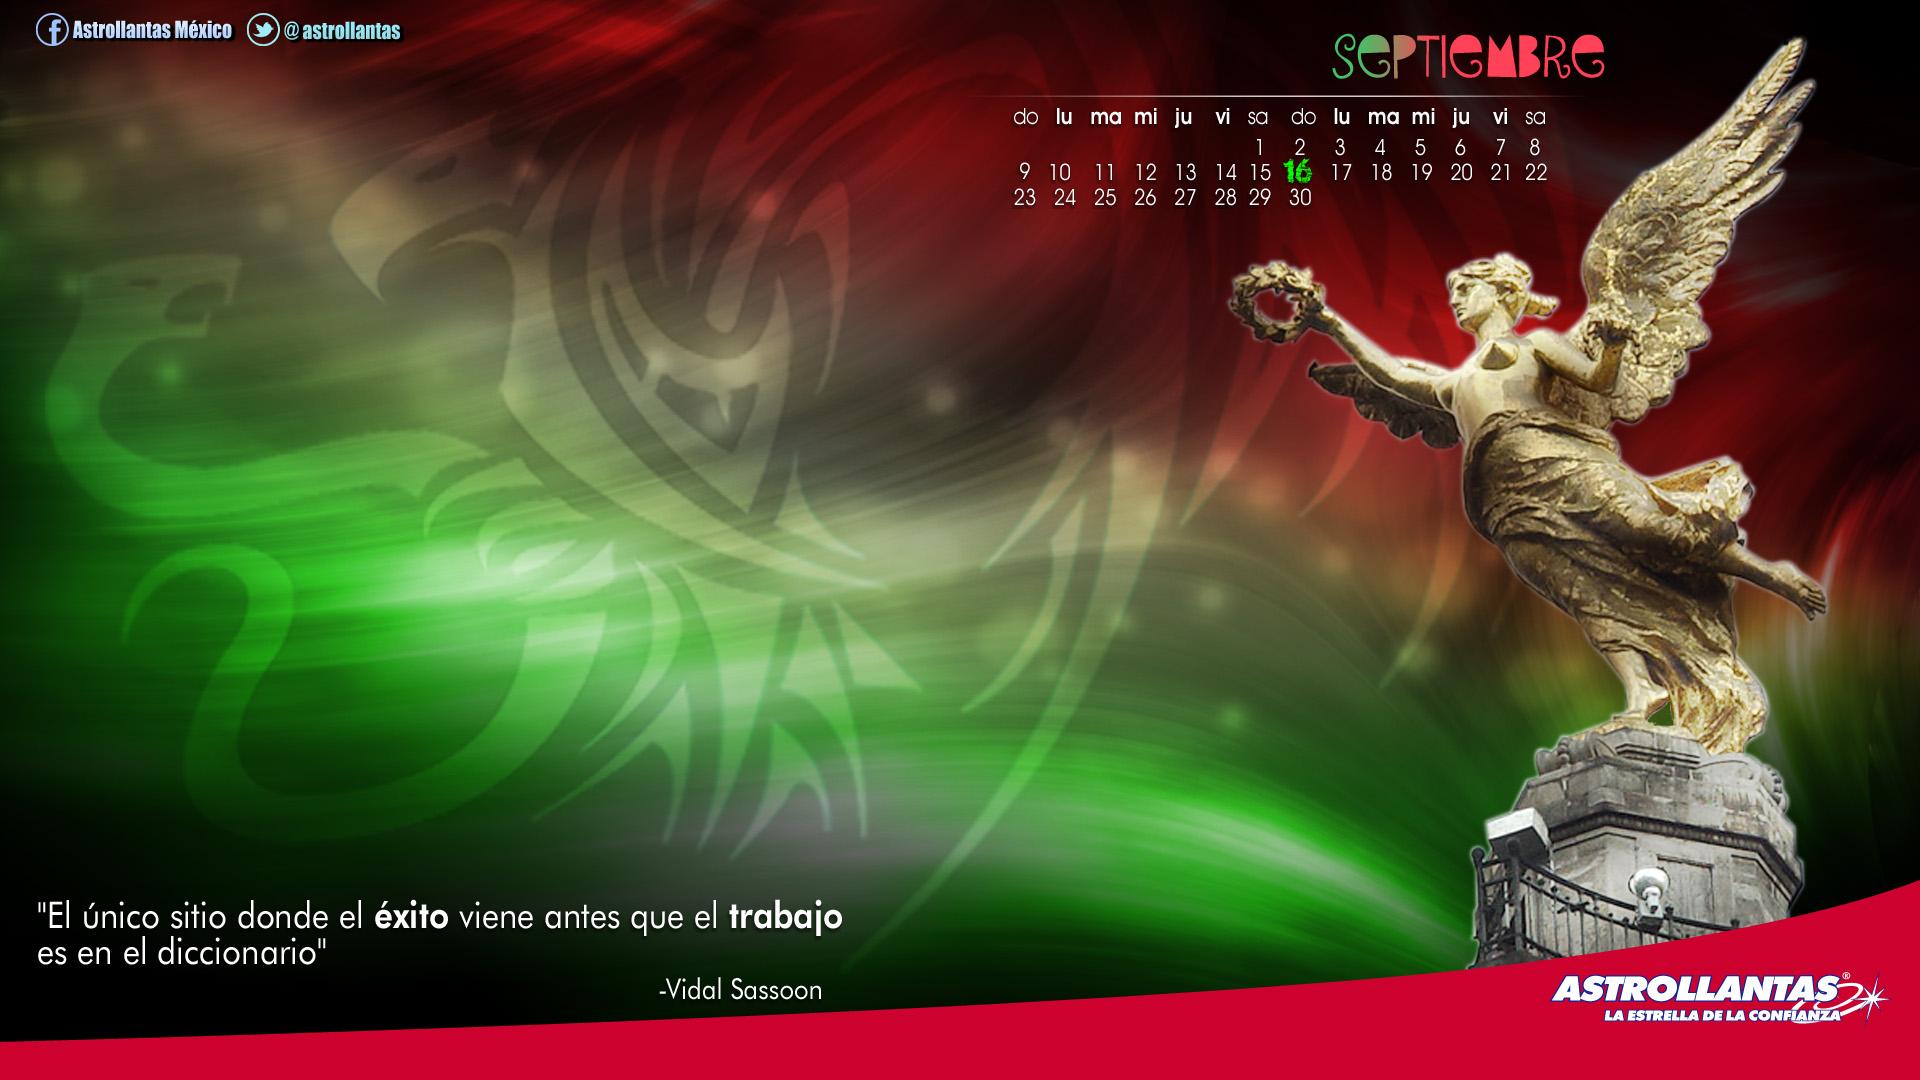 Wallpaper calendario Septiembre by kristinahetfield on DeviantArt